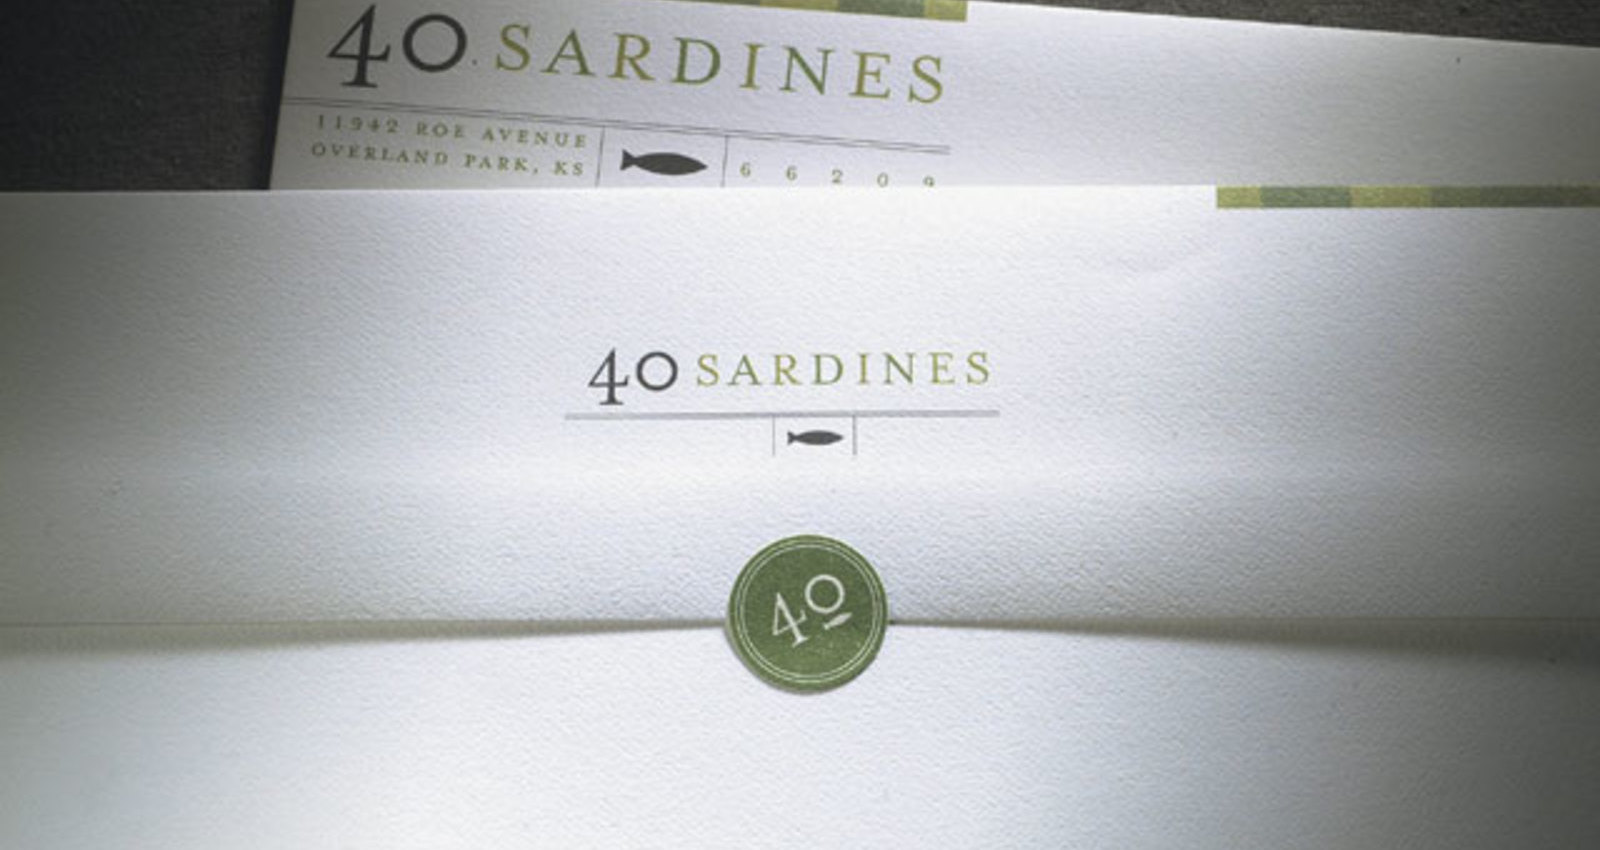 Corporate Identity 40 Sardines Restaurant